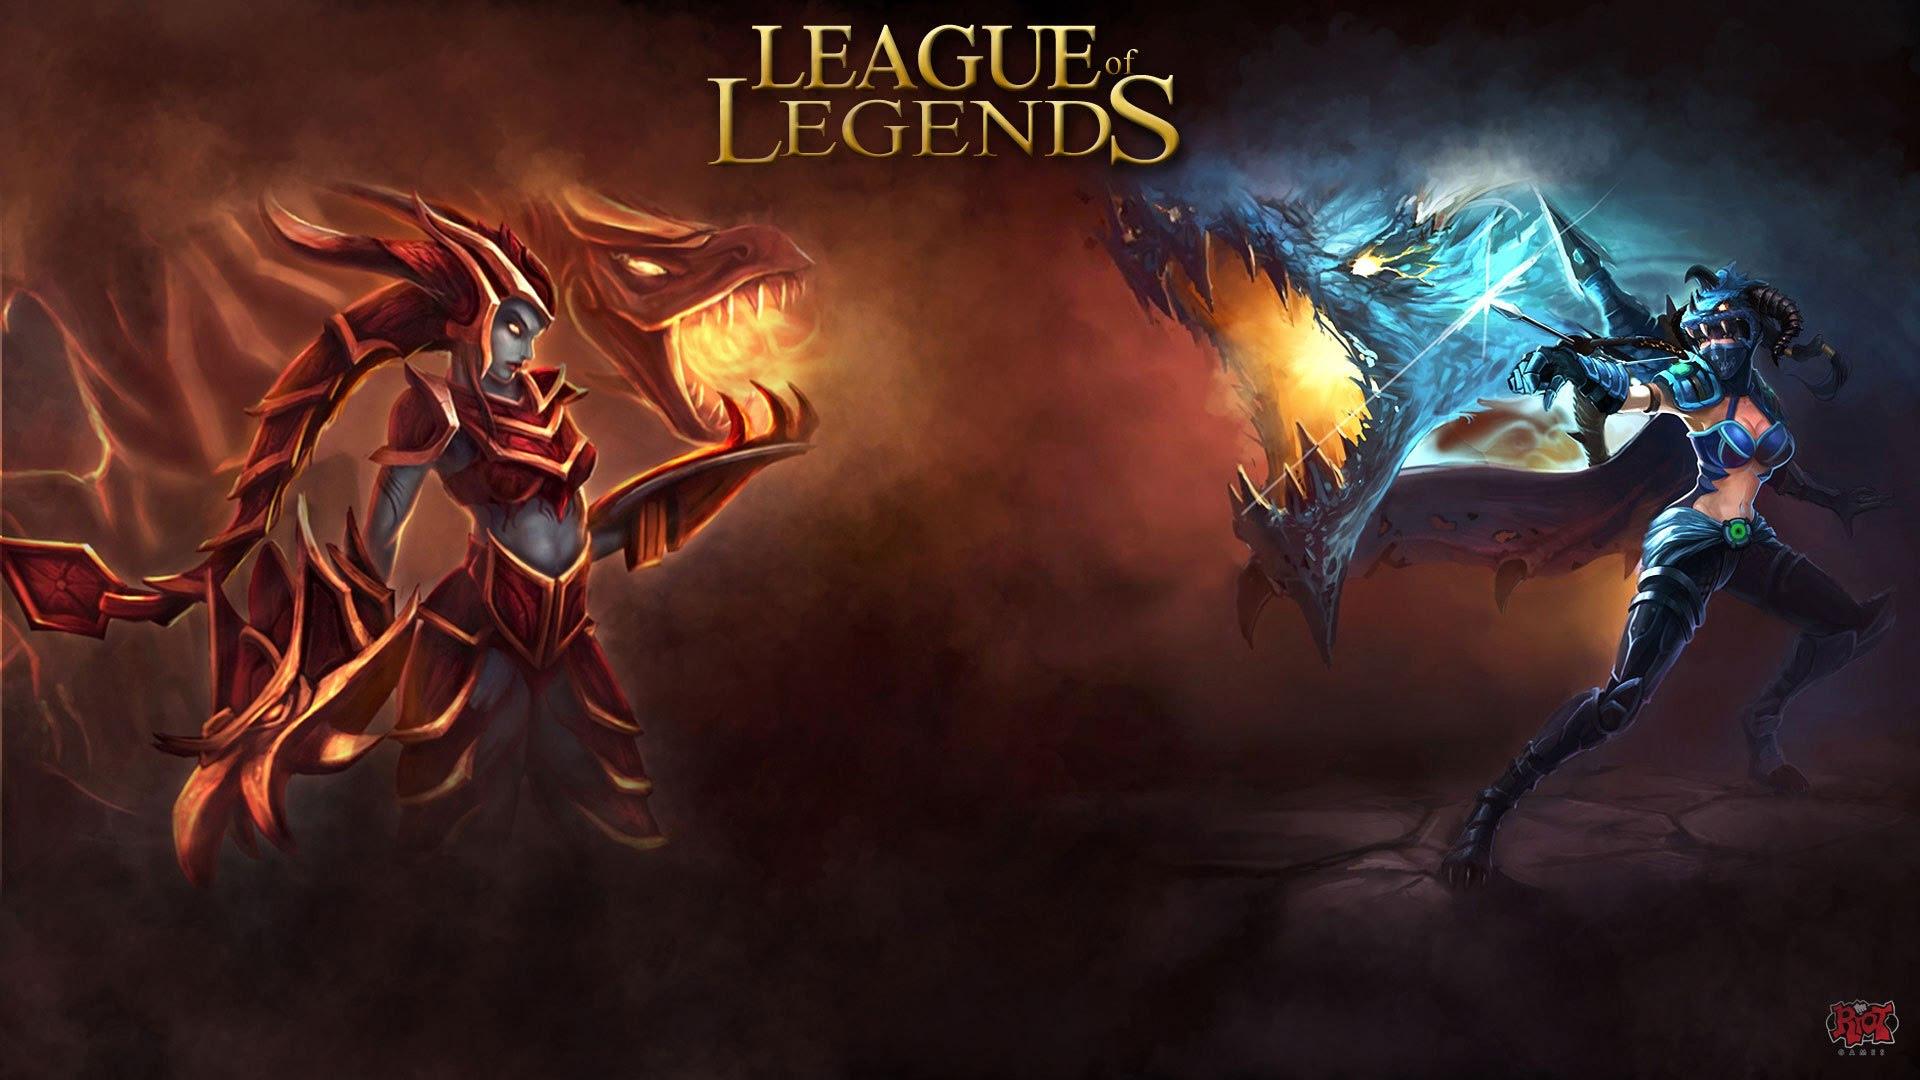 League Of Legends Wallpaper 1366x768